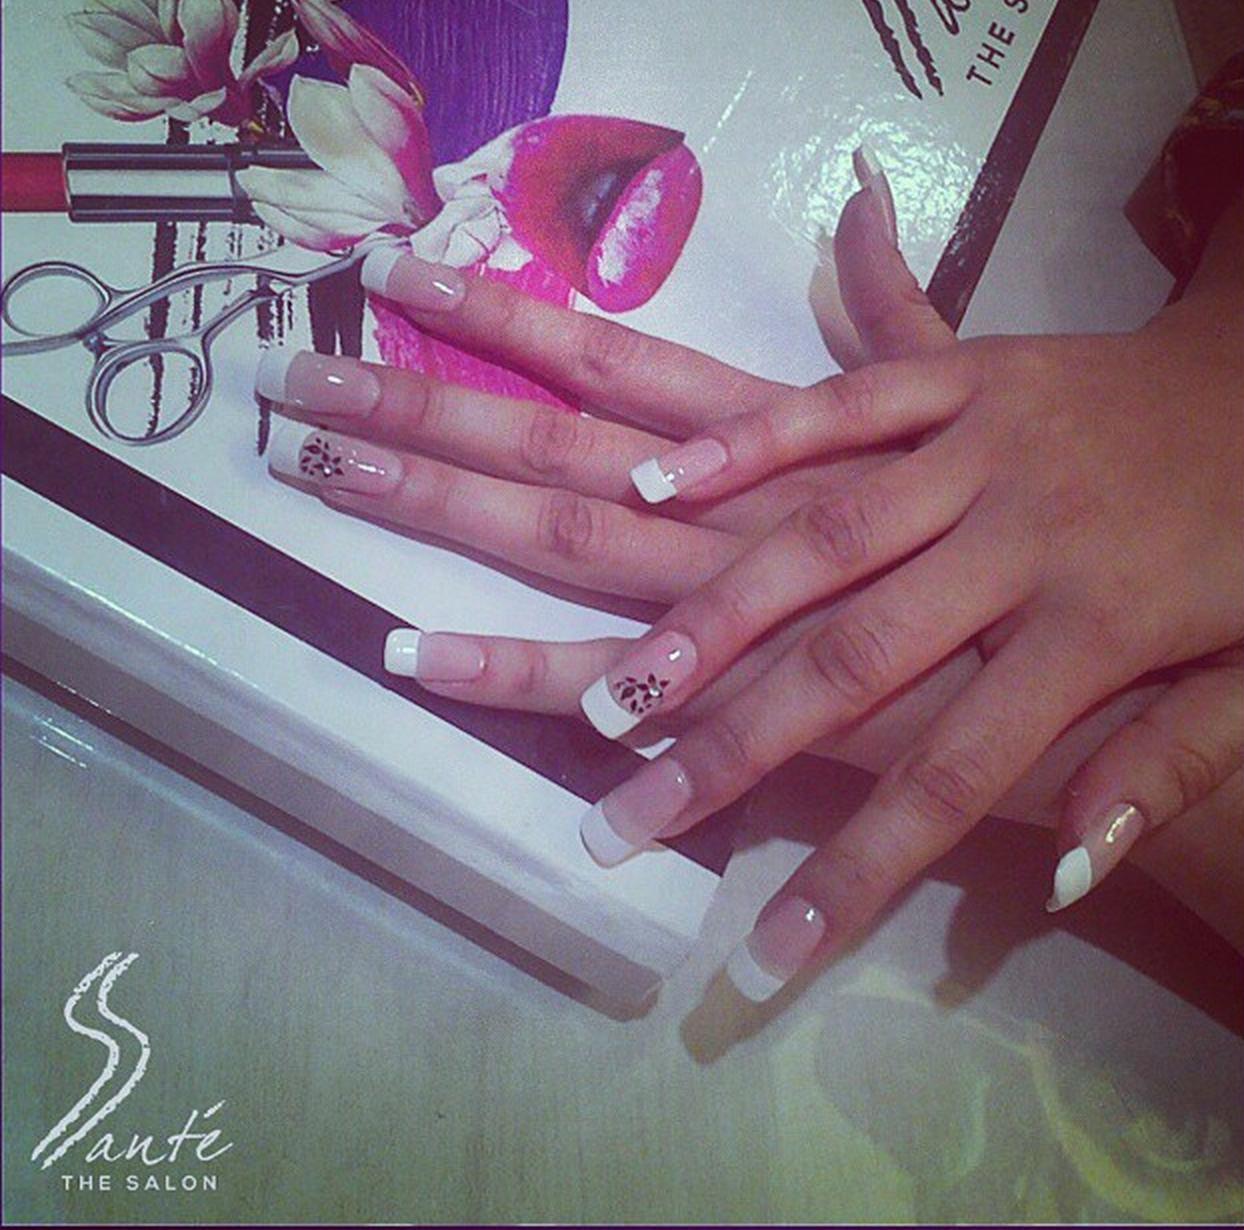 santethesalon#Acrylics at our #Nail #Bar. Call to book an ...